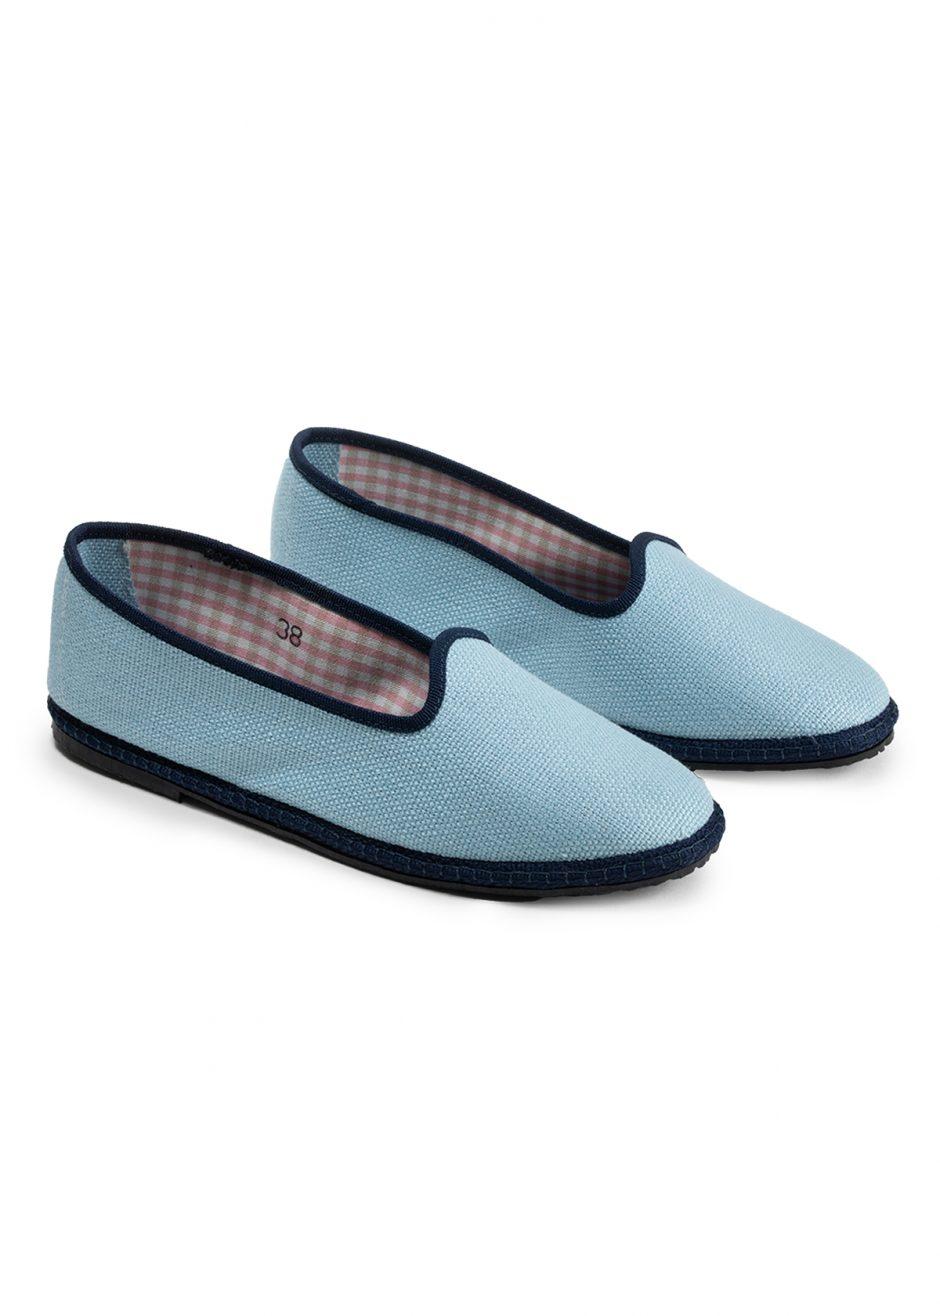 Daisy – Furlana sky blue linen